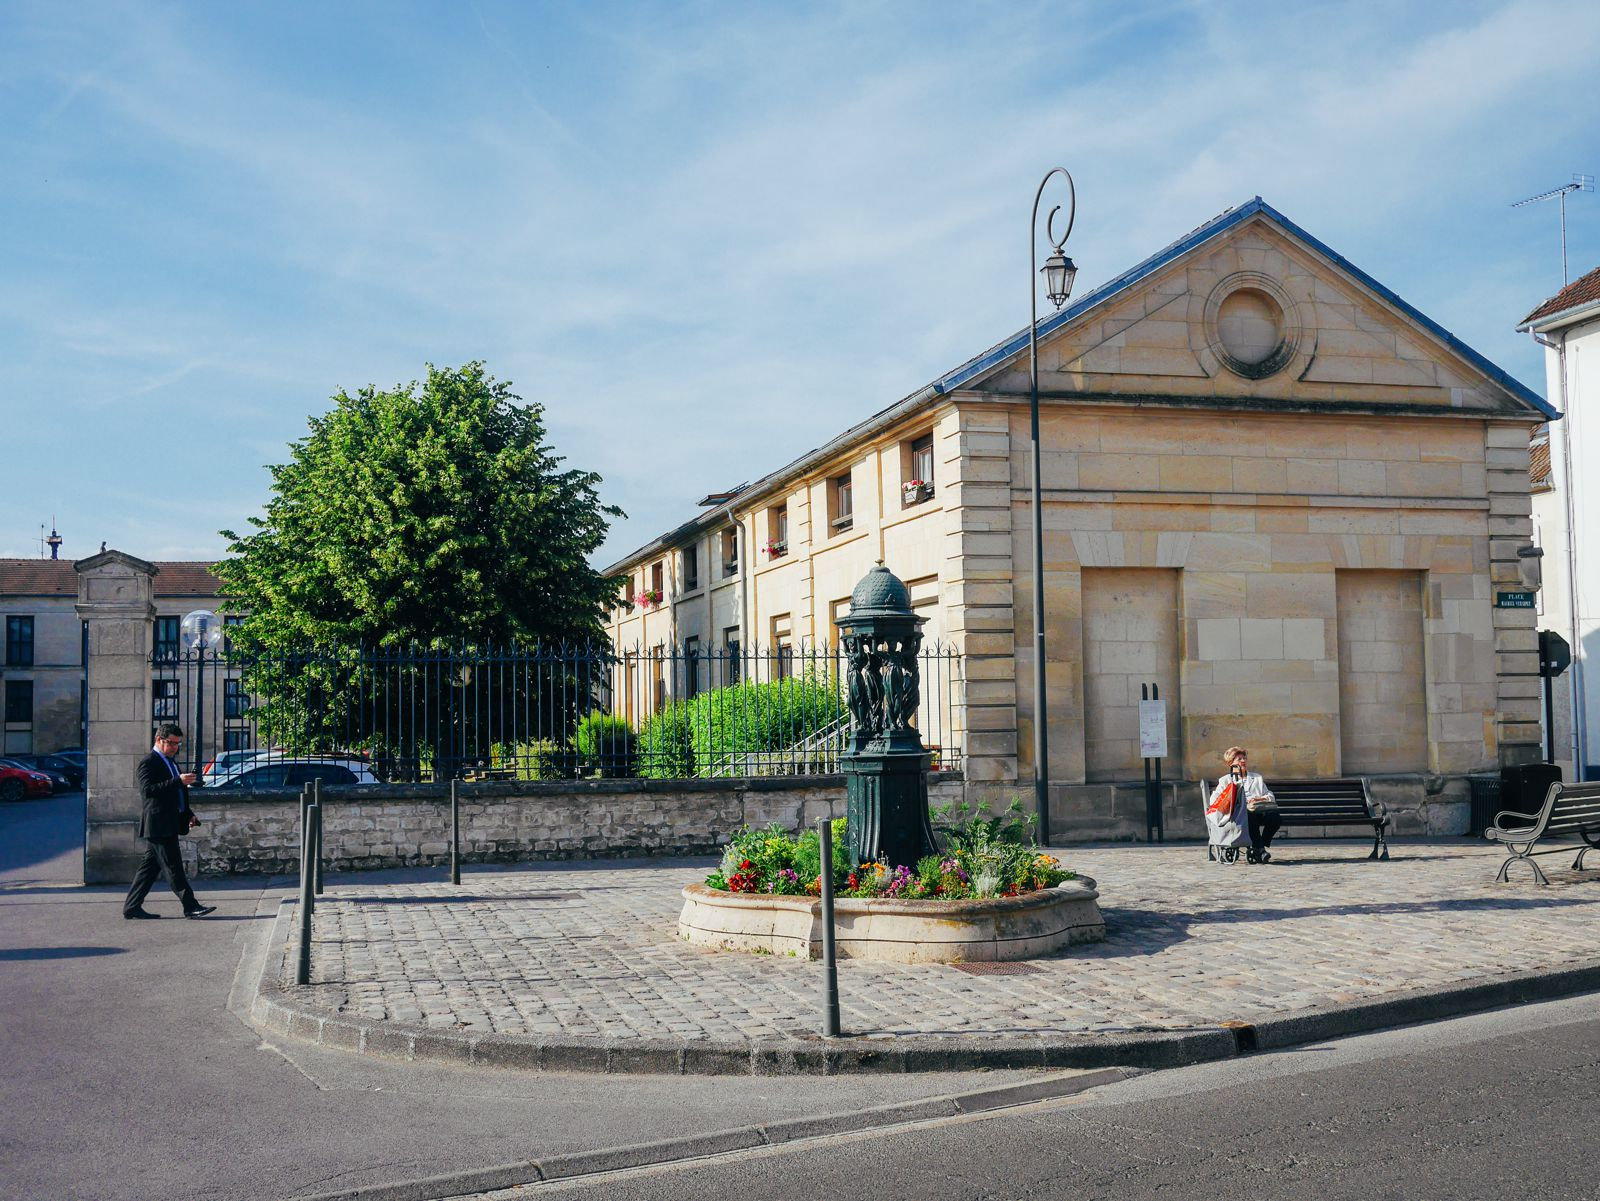 Chantilly, France. A Photo Diary... (2)